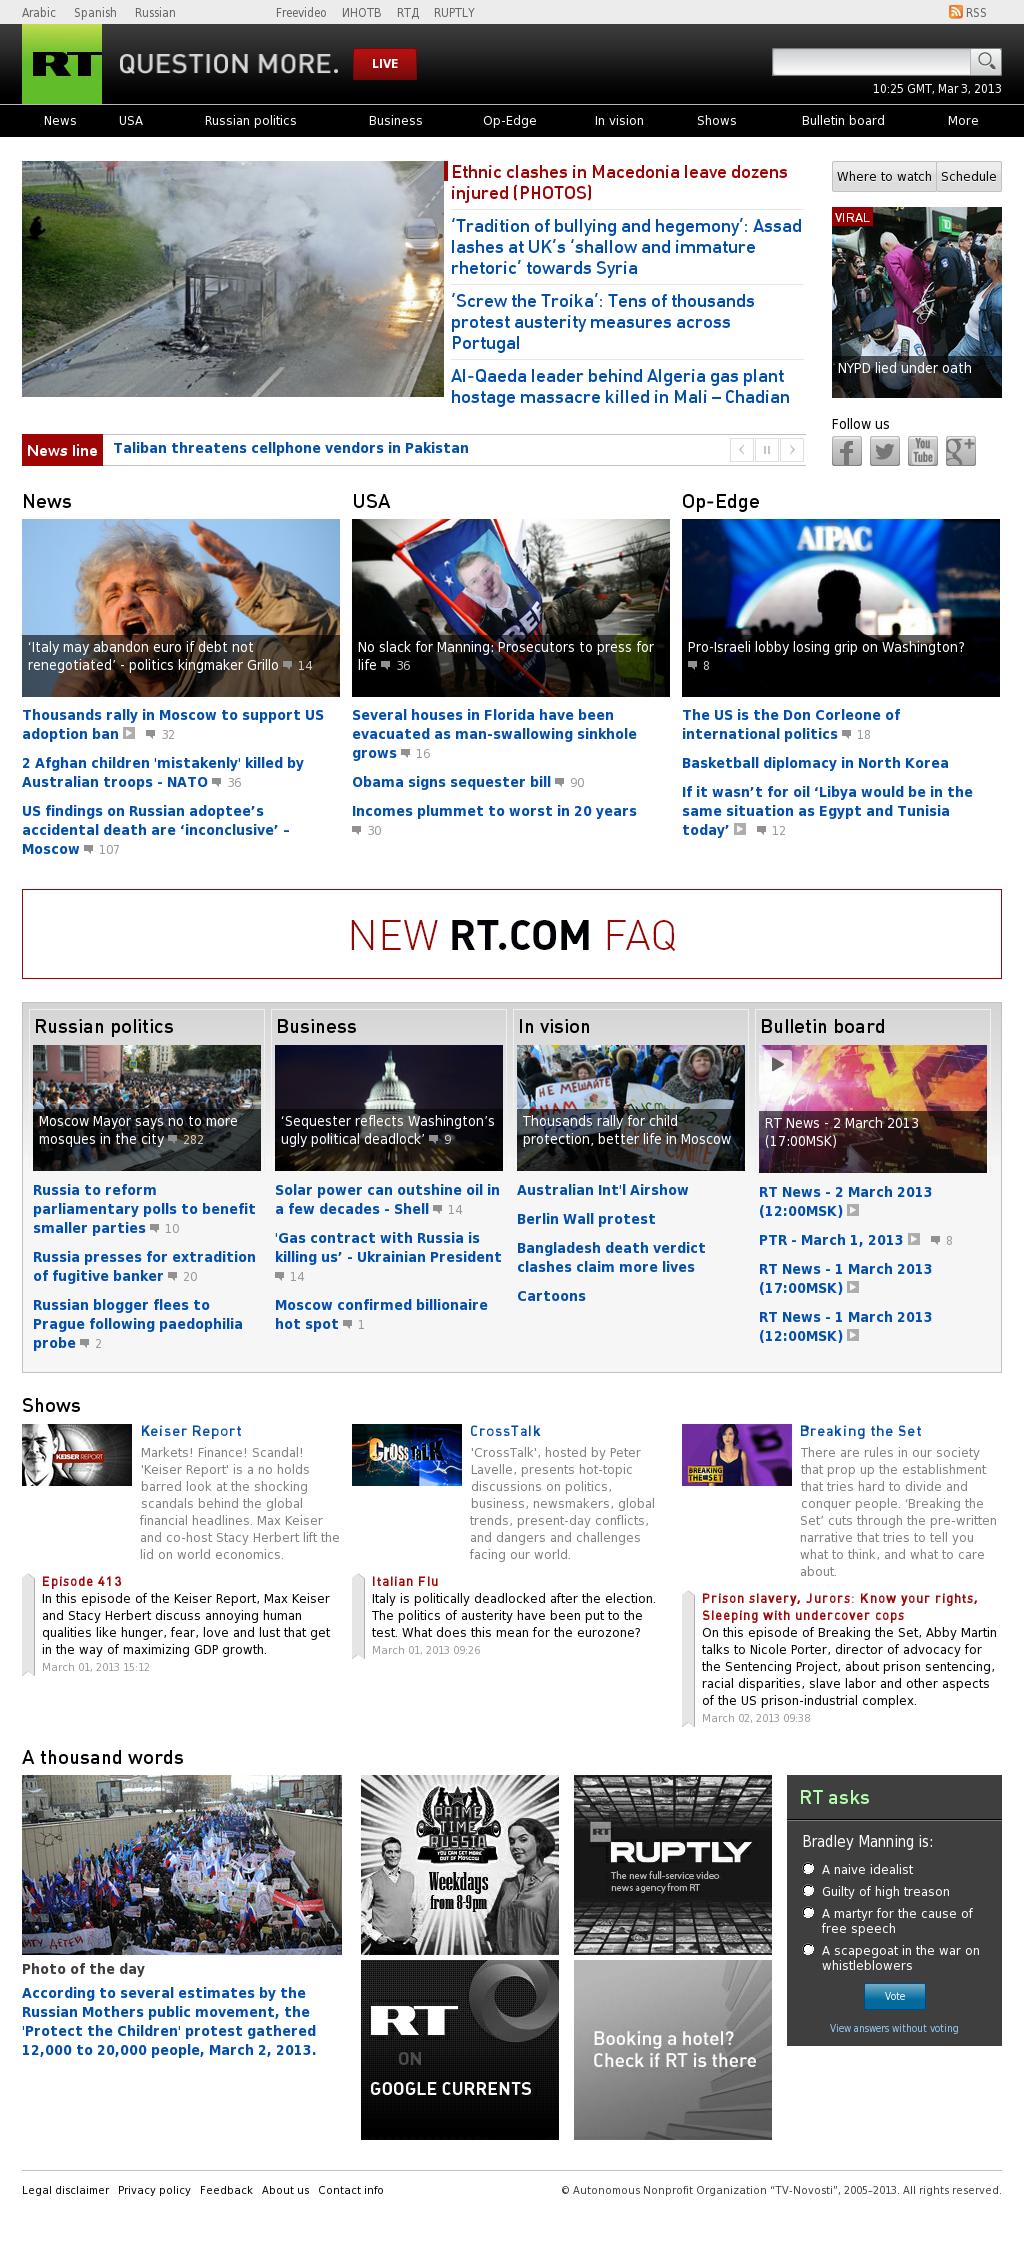 RT at Sunday March 3, 2013, 10:25 a.m. UTC